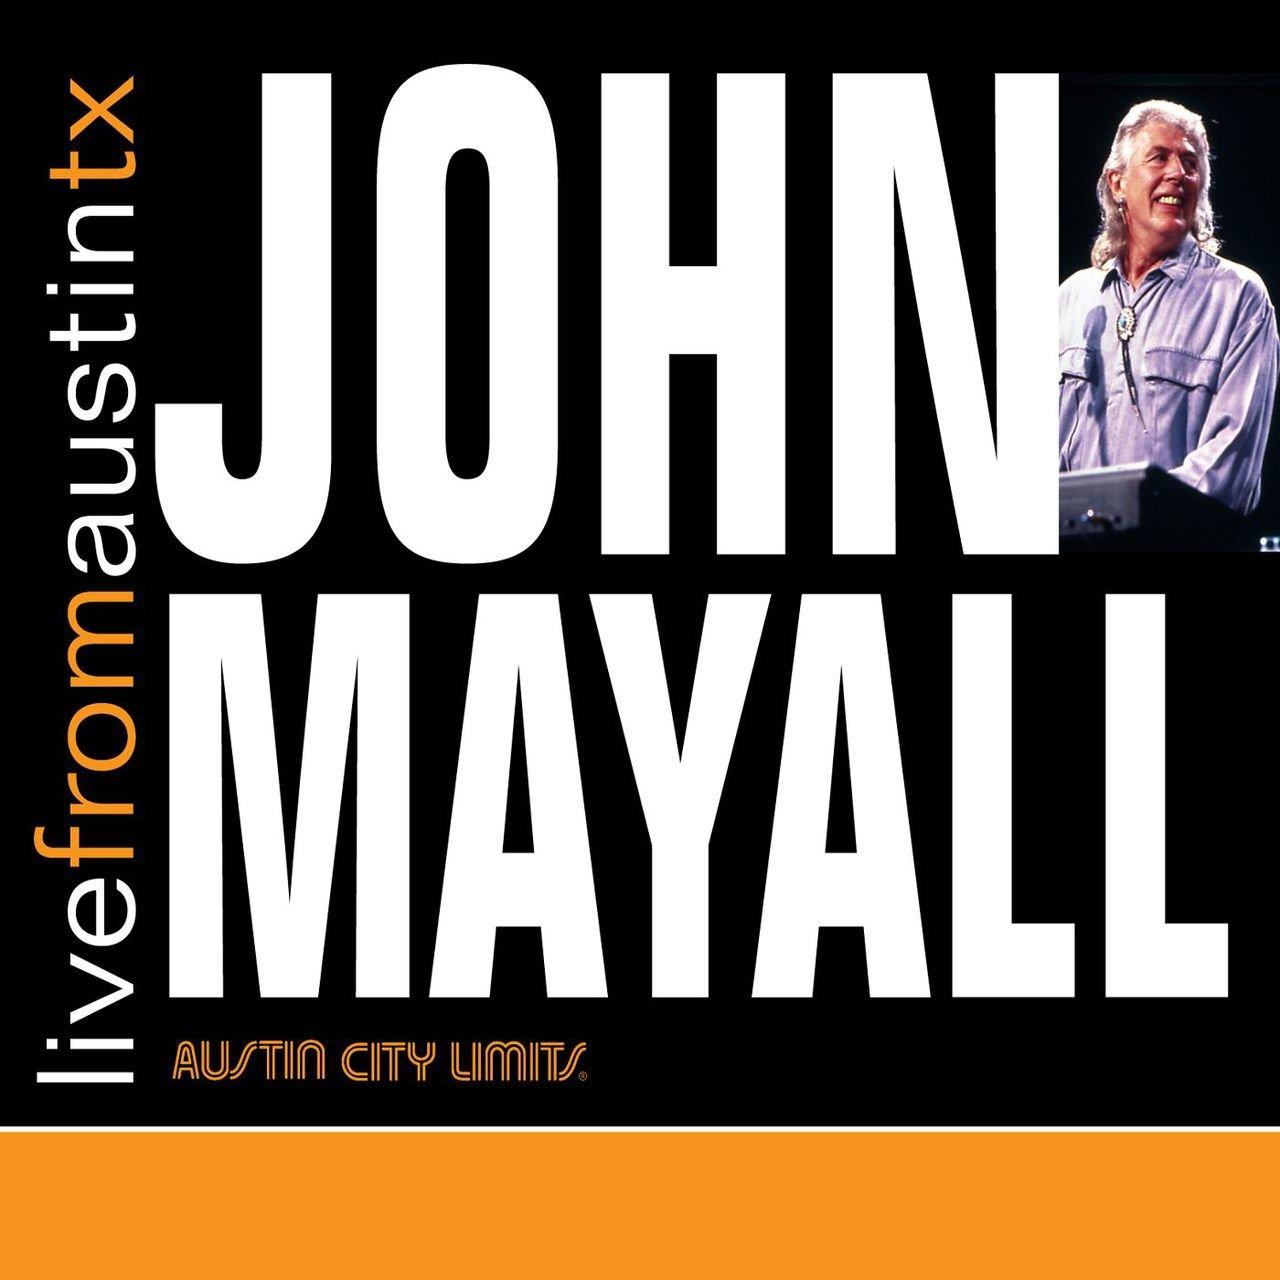 TIDAL: Listen to John Mayall on TIDAL